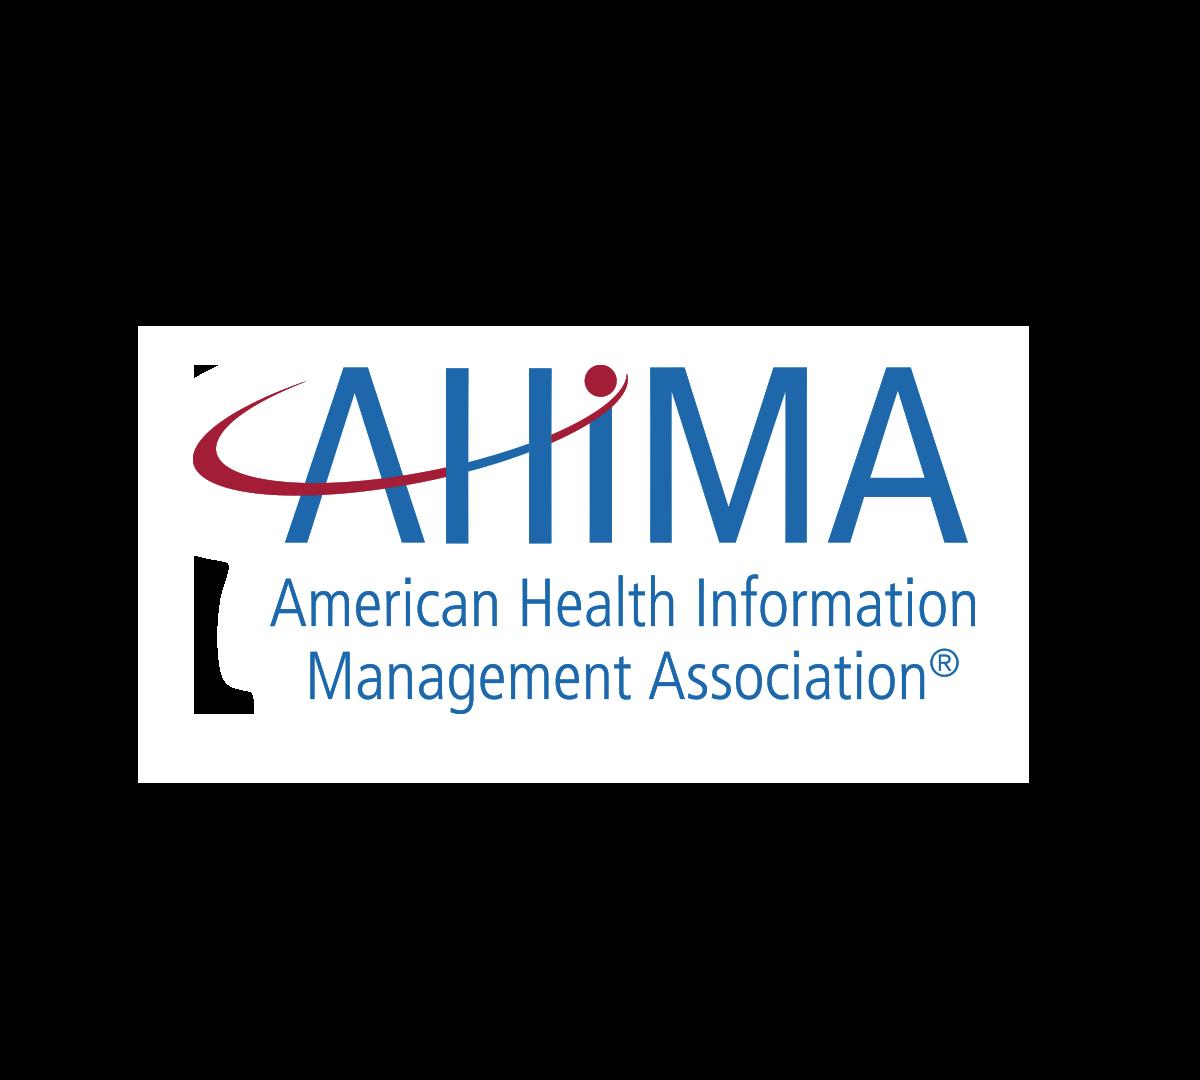 ahima shadow doola medical billing coding abebooks biz tammy potts combs conversation melissa association management artifact grants